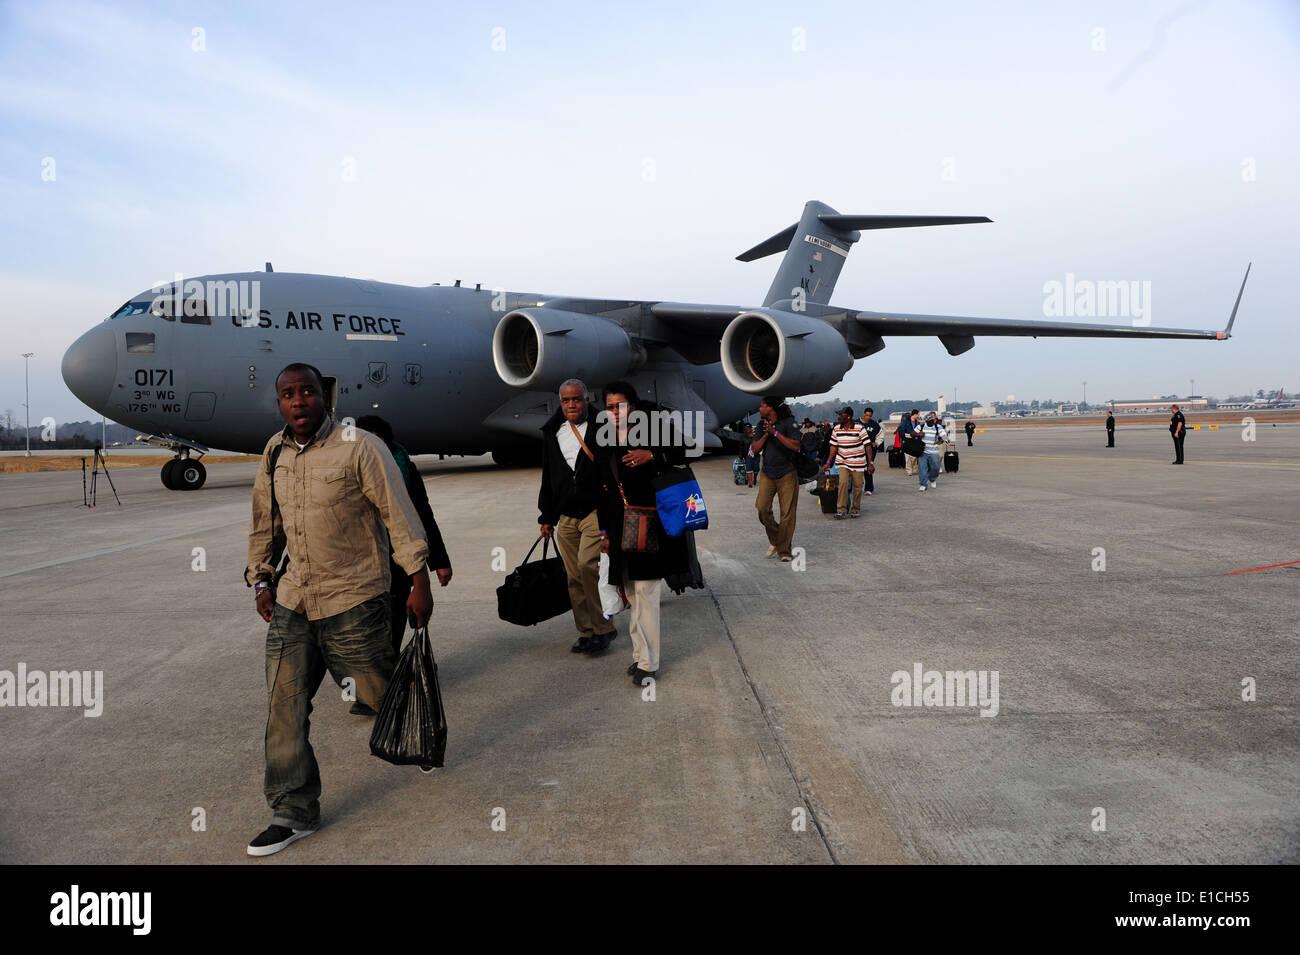 U.S. citizens evacuated from Haiti disembark a U.S. Air Force C-17 Globemaster III aircraft at the Charleston International Air - Stock Image